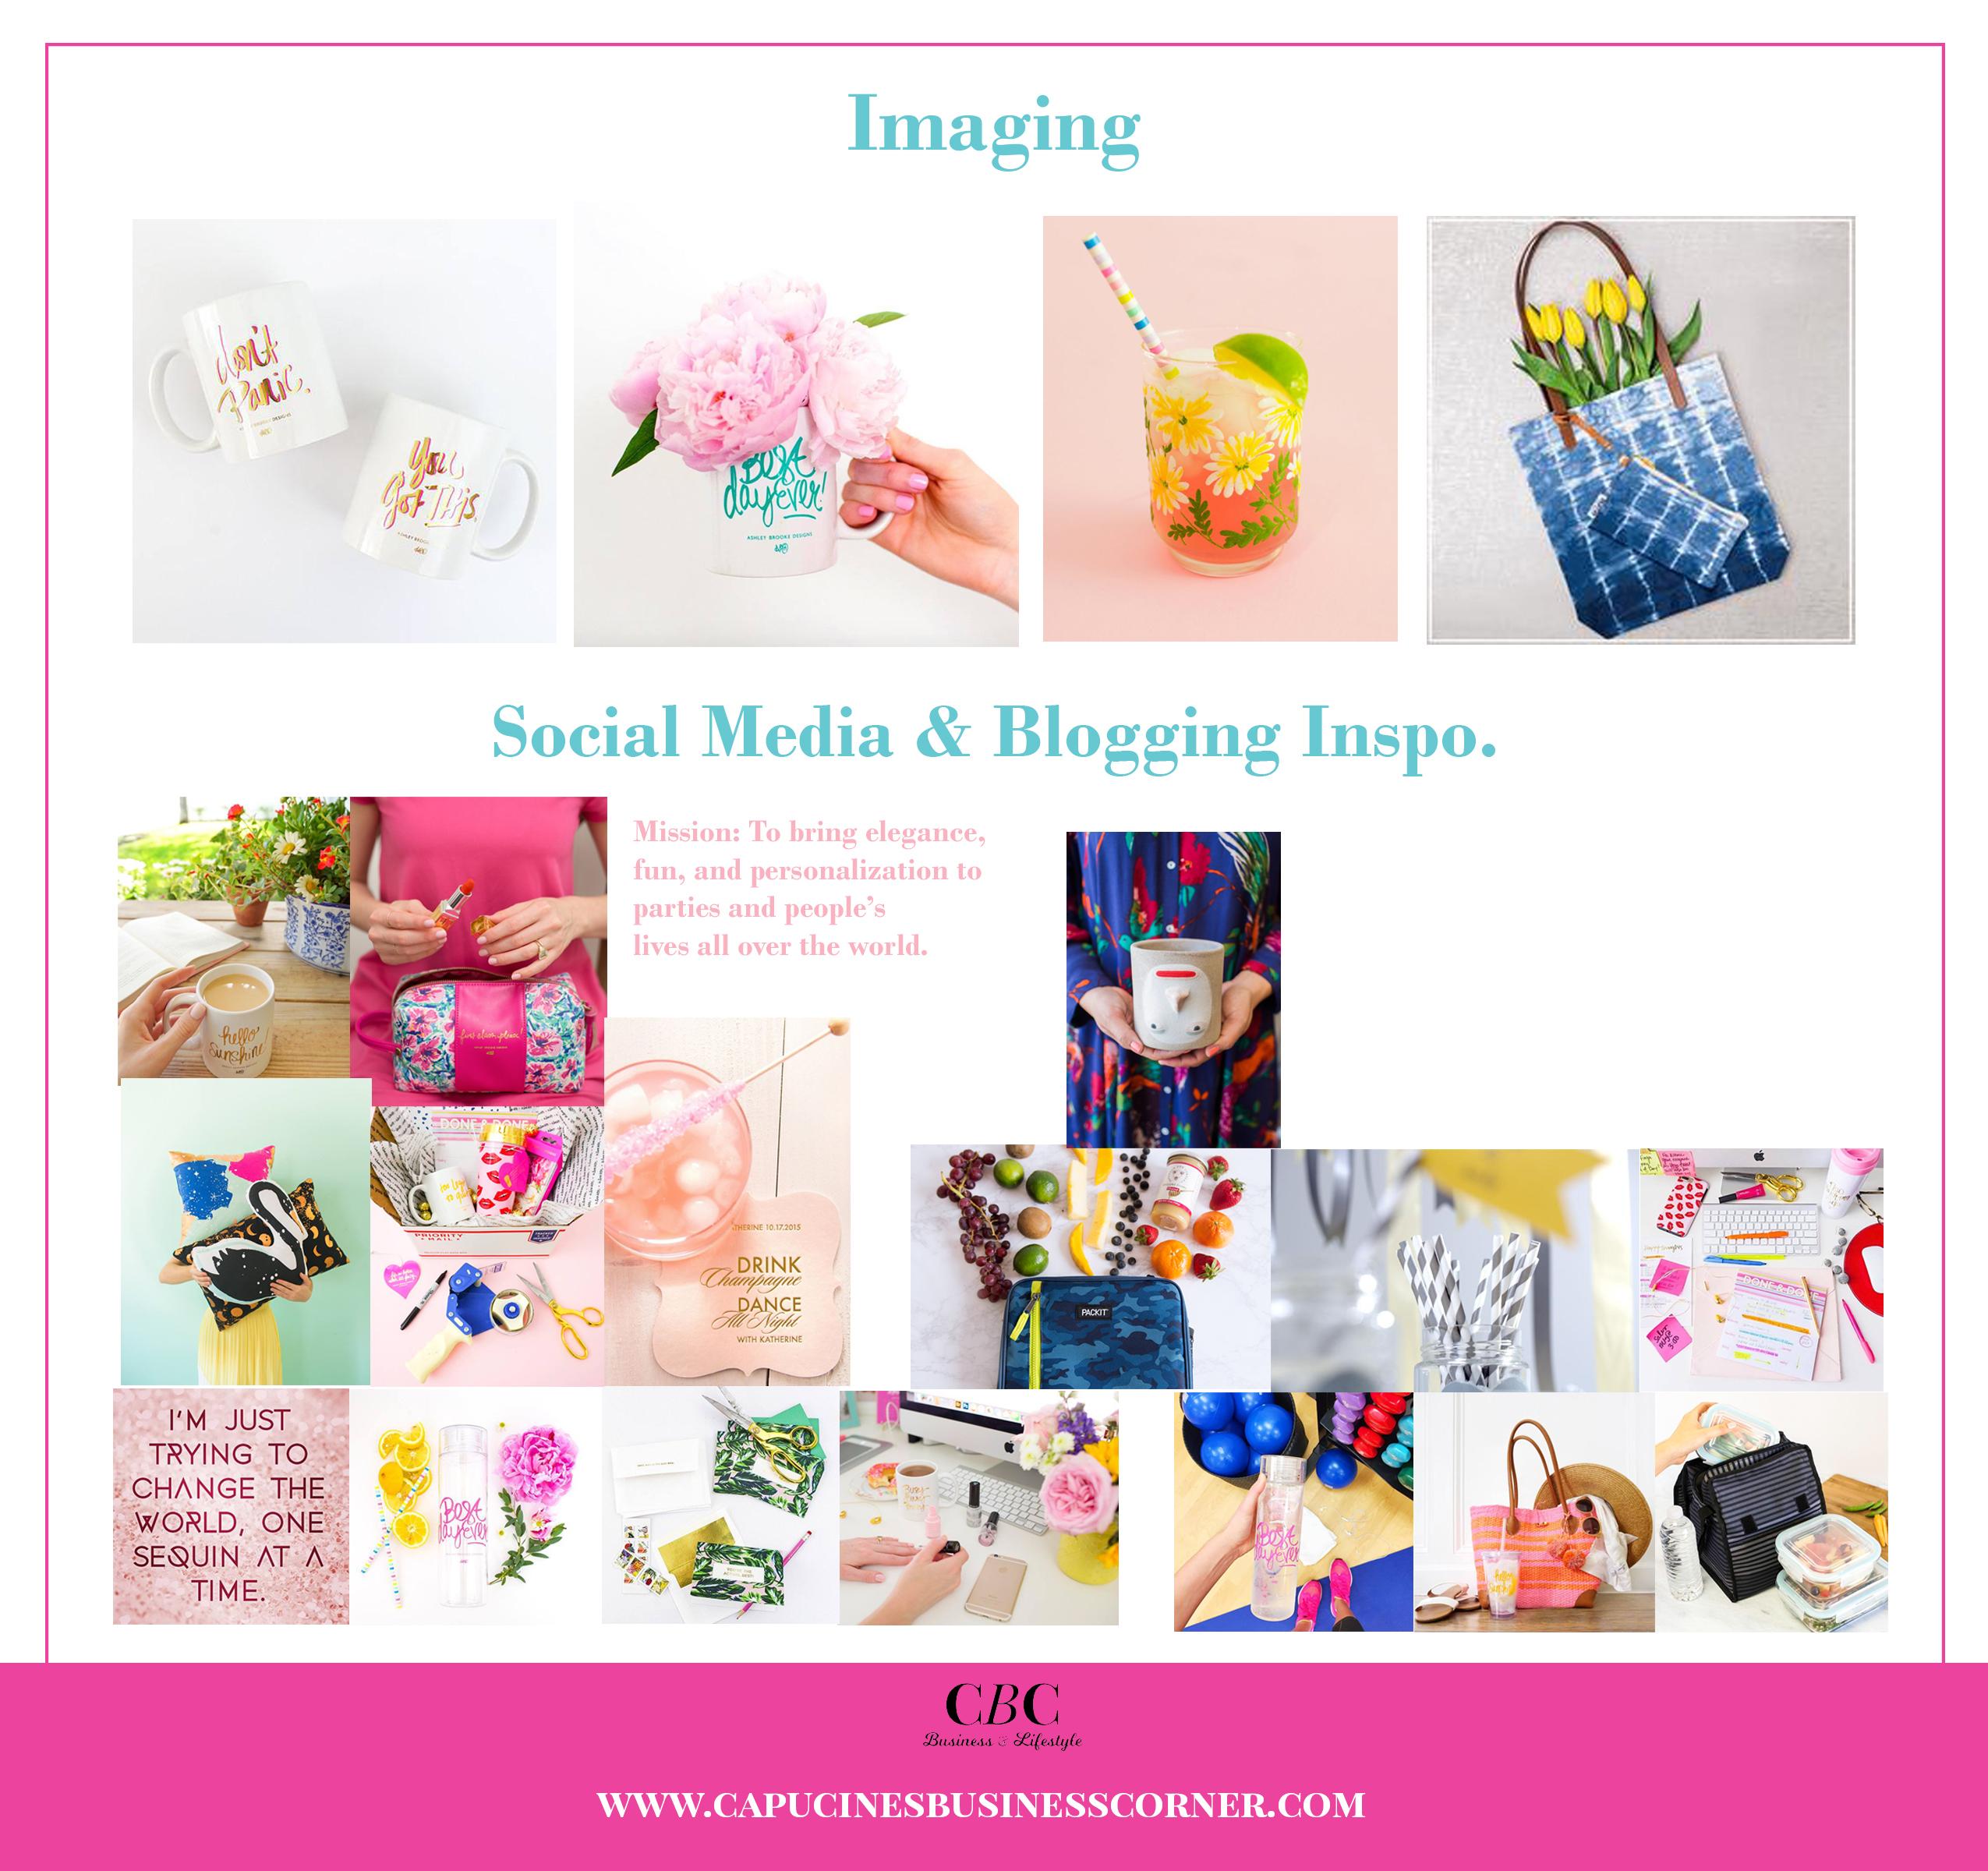 Branding board Capucines-Business-Corner imagery